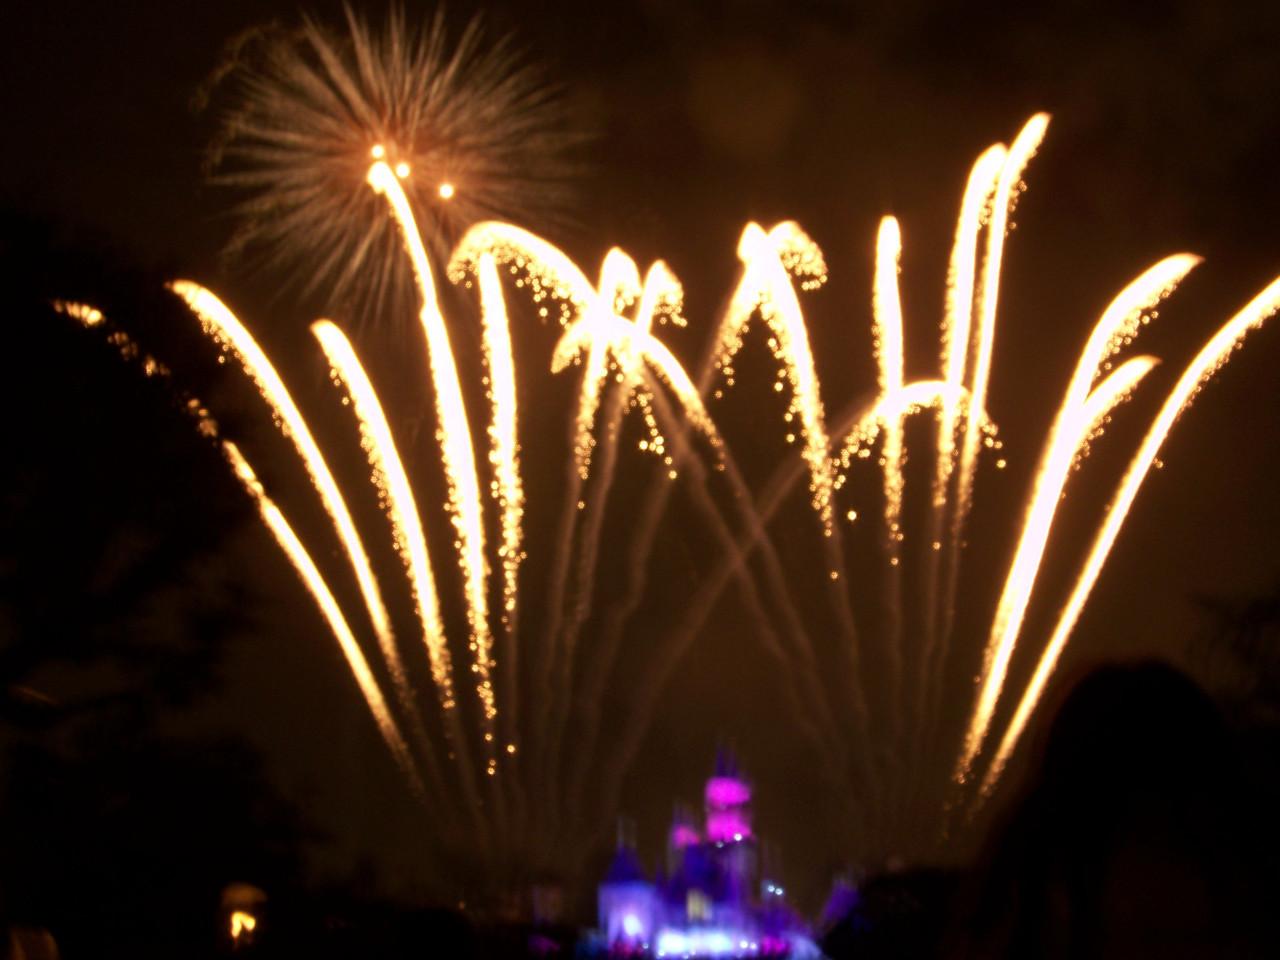 Disneyland - Christmas fireworks